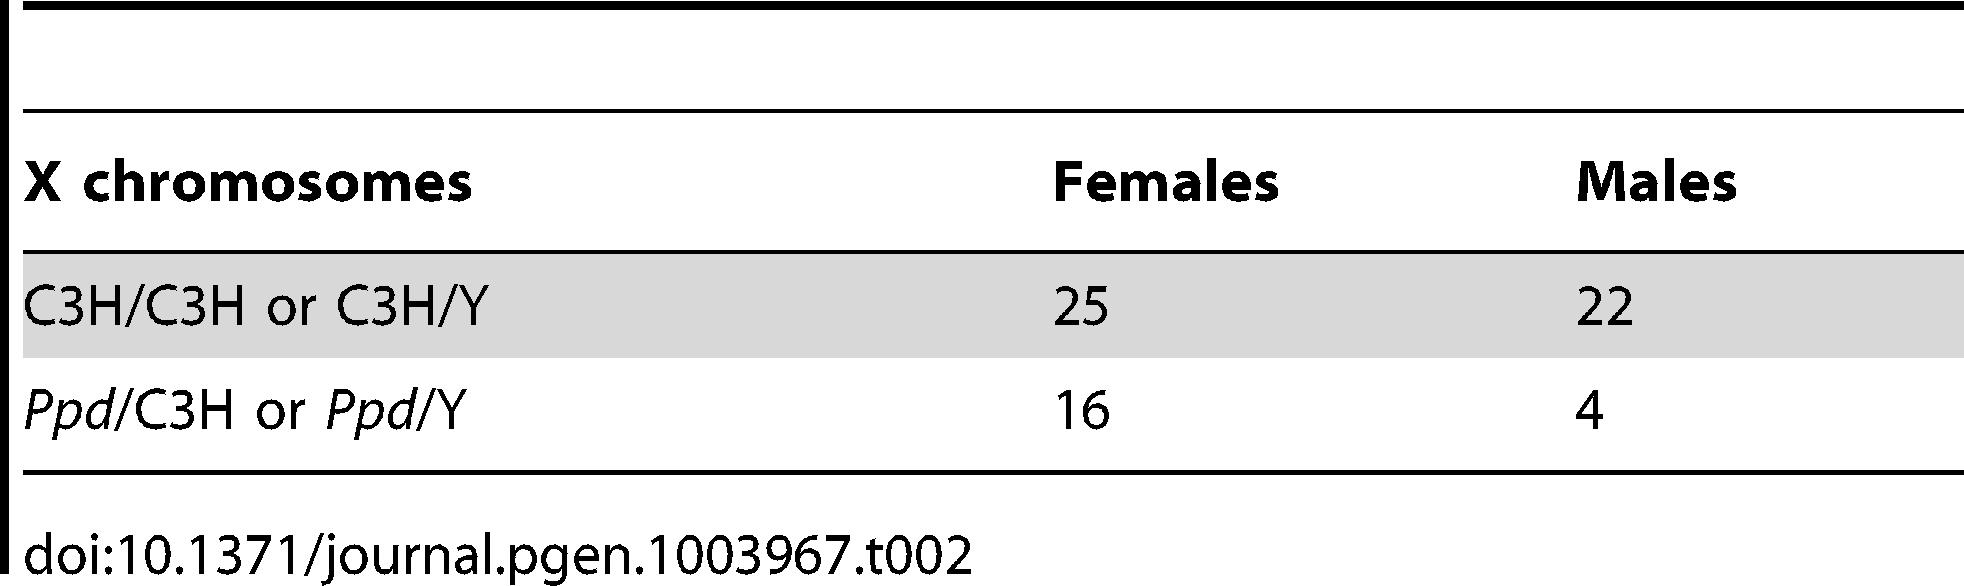 Reduced <i>Ppd</i> chromosomes at birth – C3H cross.